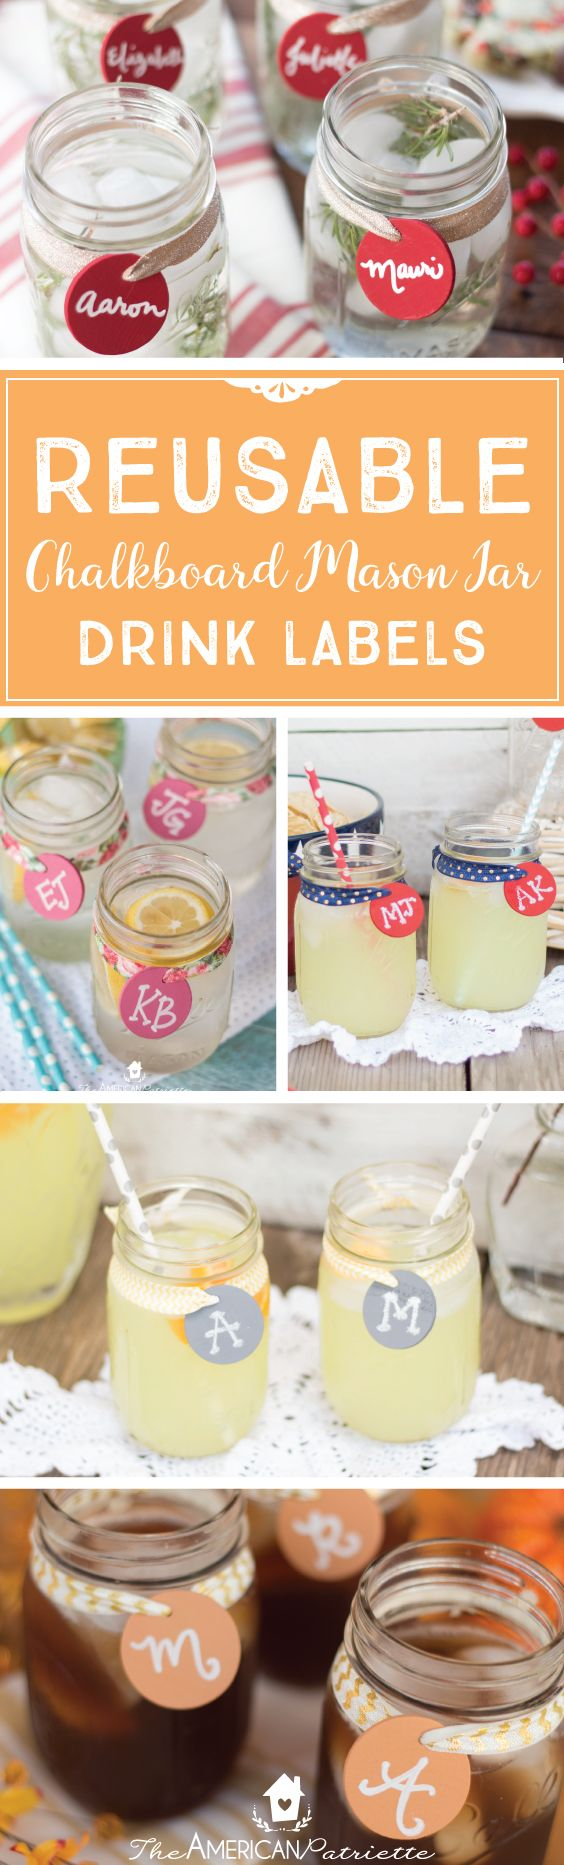 Reusable Chalkboard Mason Jar Drink Labels; Mason Jar Crafts; Chalkboard Drink Tags; Entertaining; Hospitality; Party Drink Ideas